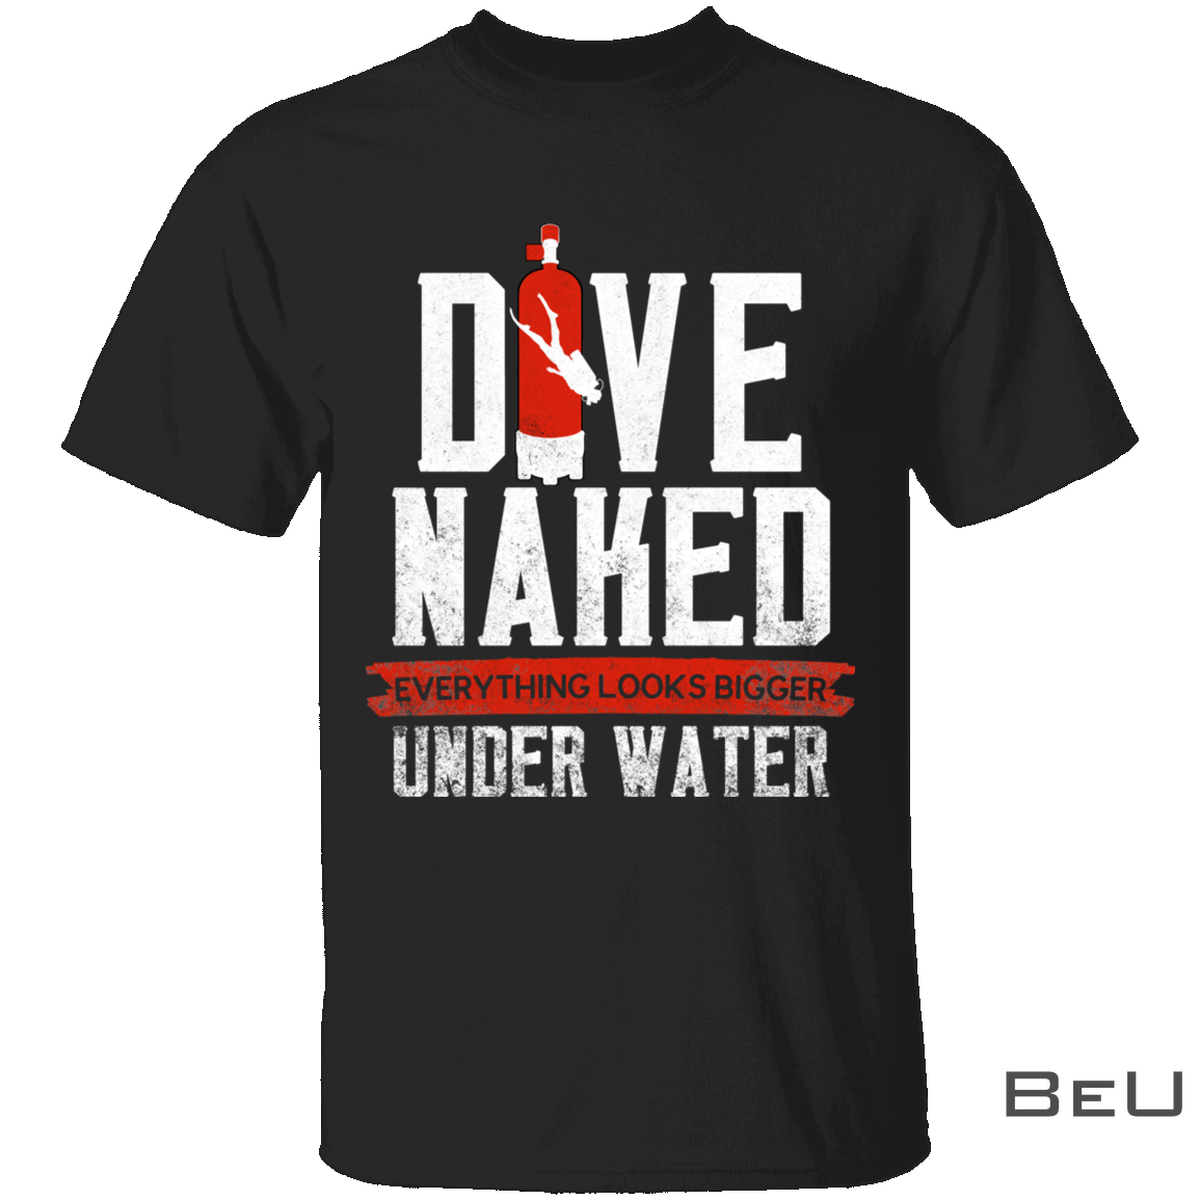 Dove Naked Everything Look Bigger Underwater Shirt